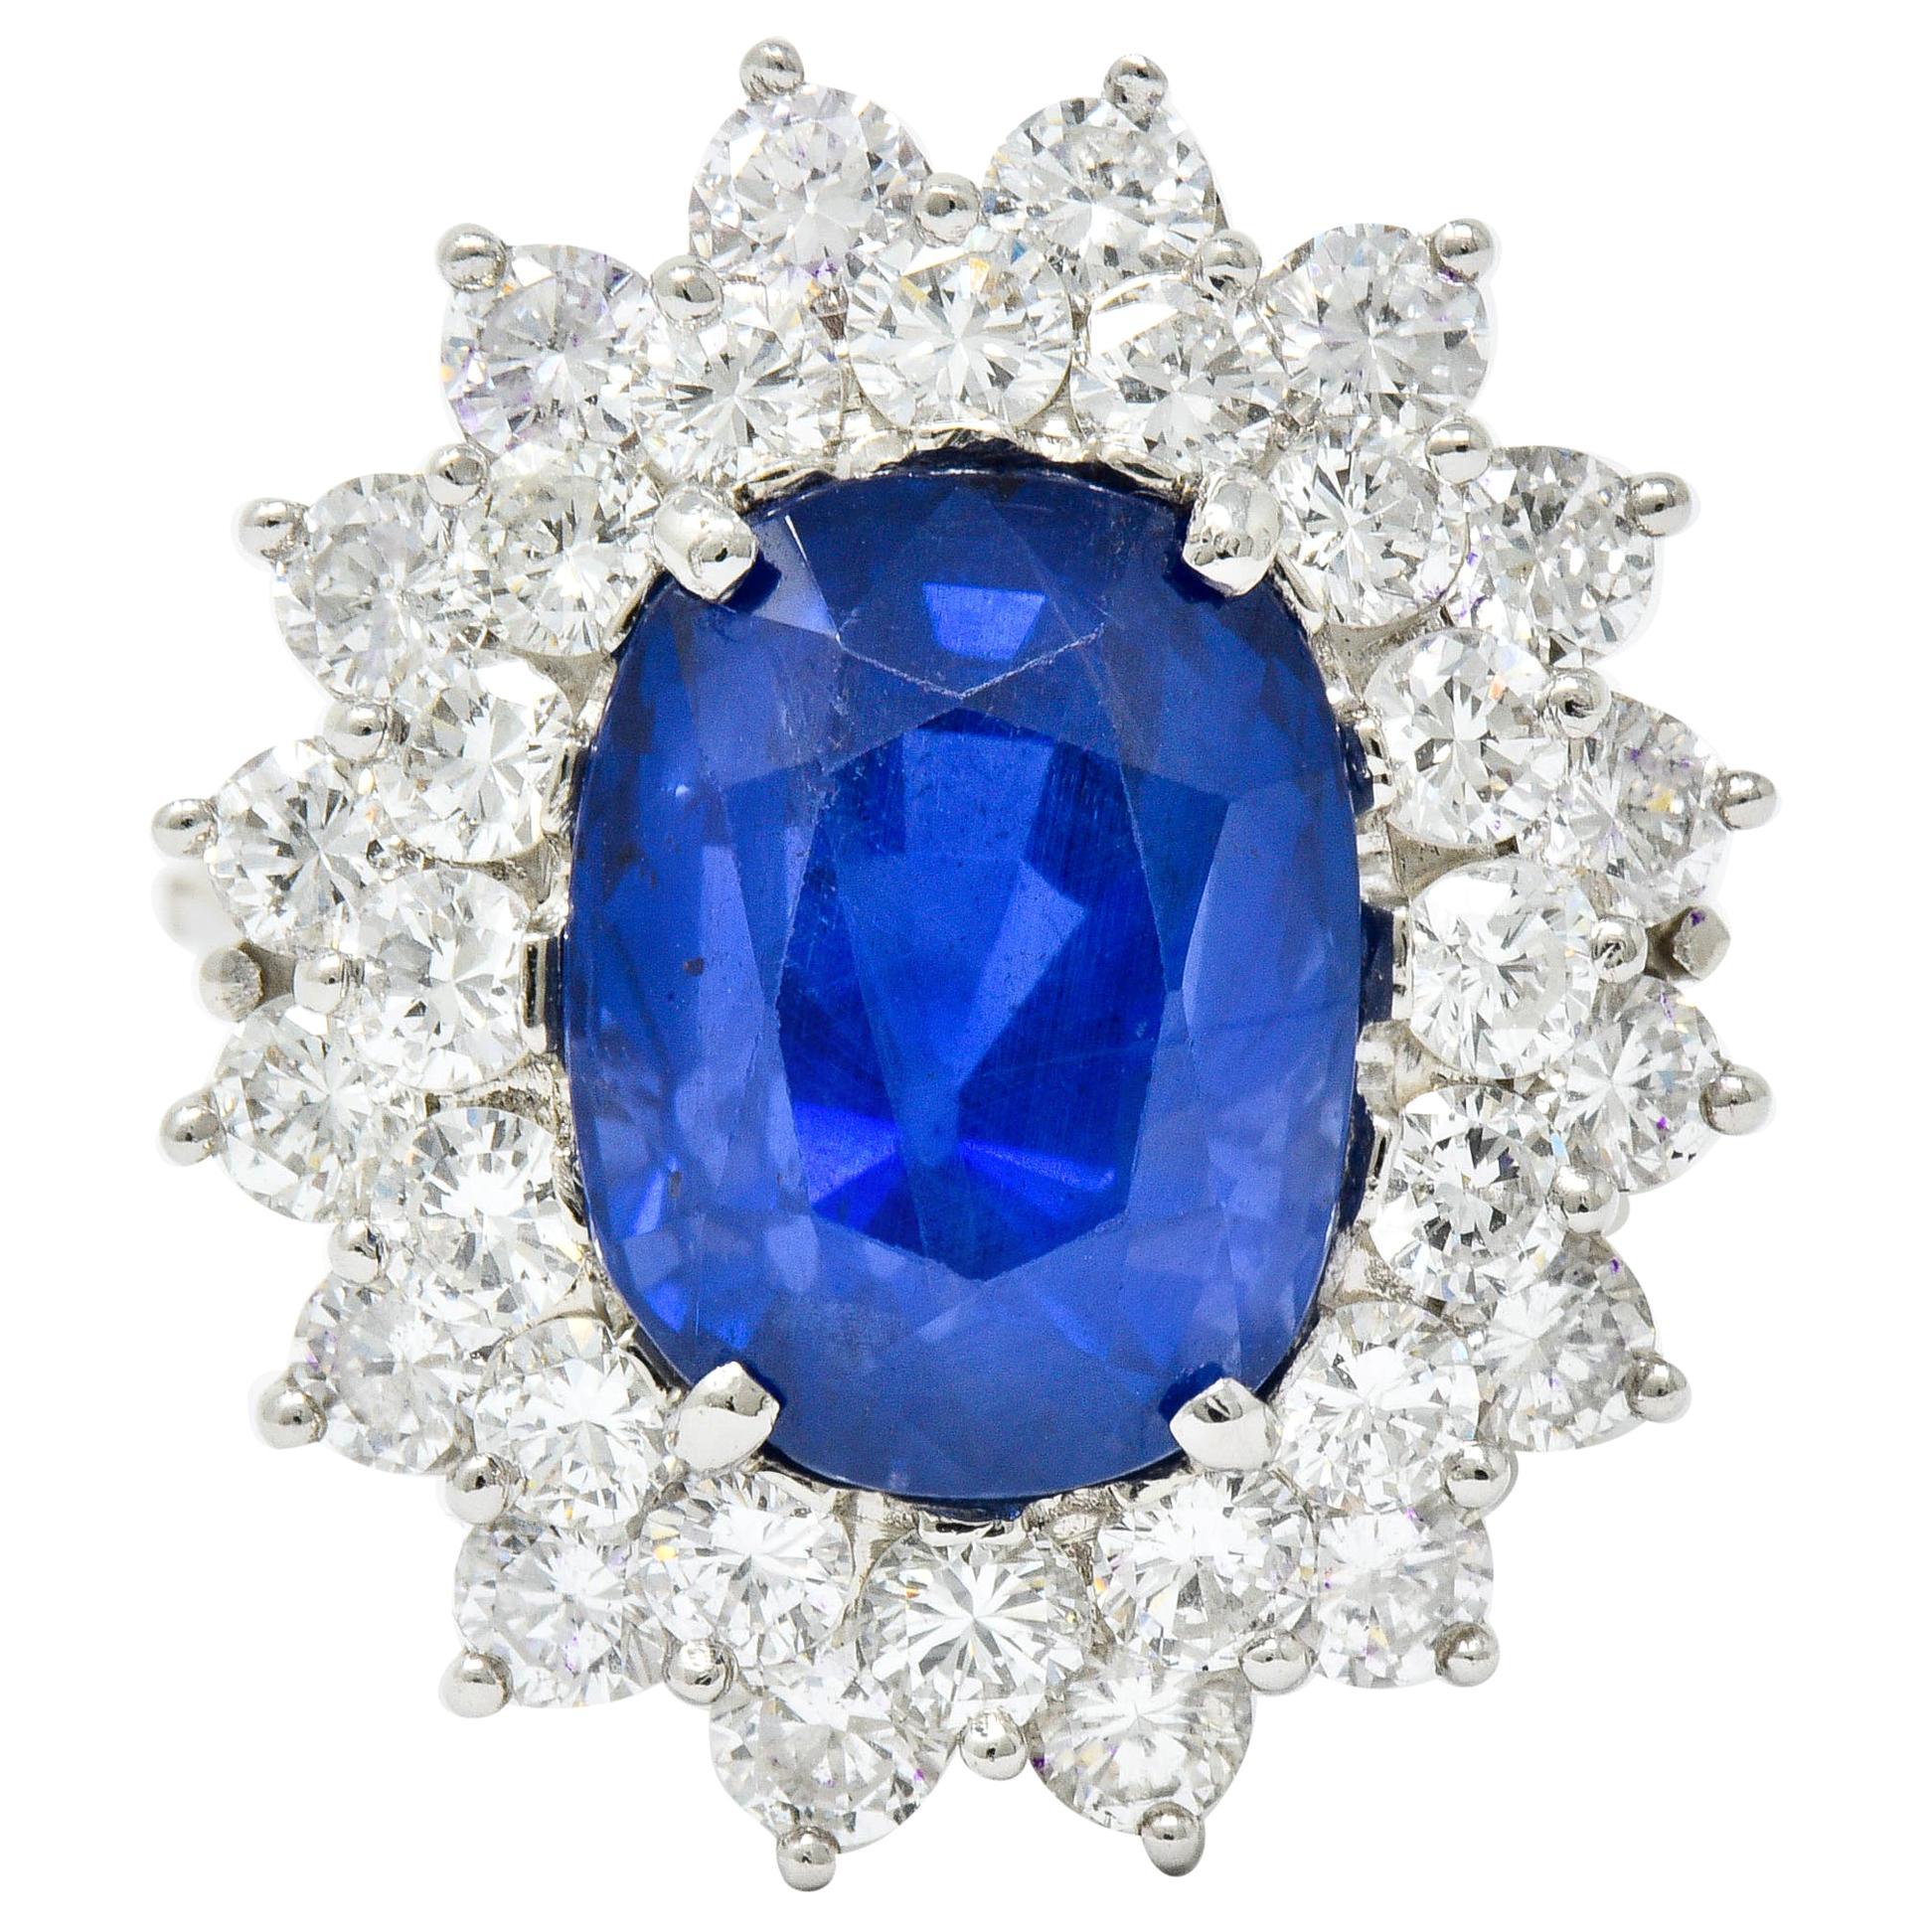 Impressive 13.63 Carat No Heat Ceylon Sapphire Diamond Platinum Cluster Ring